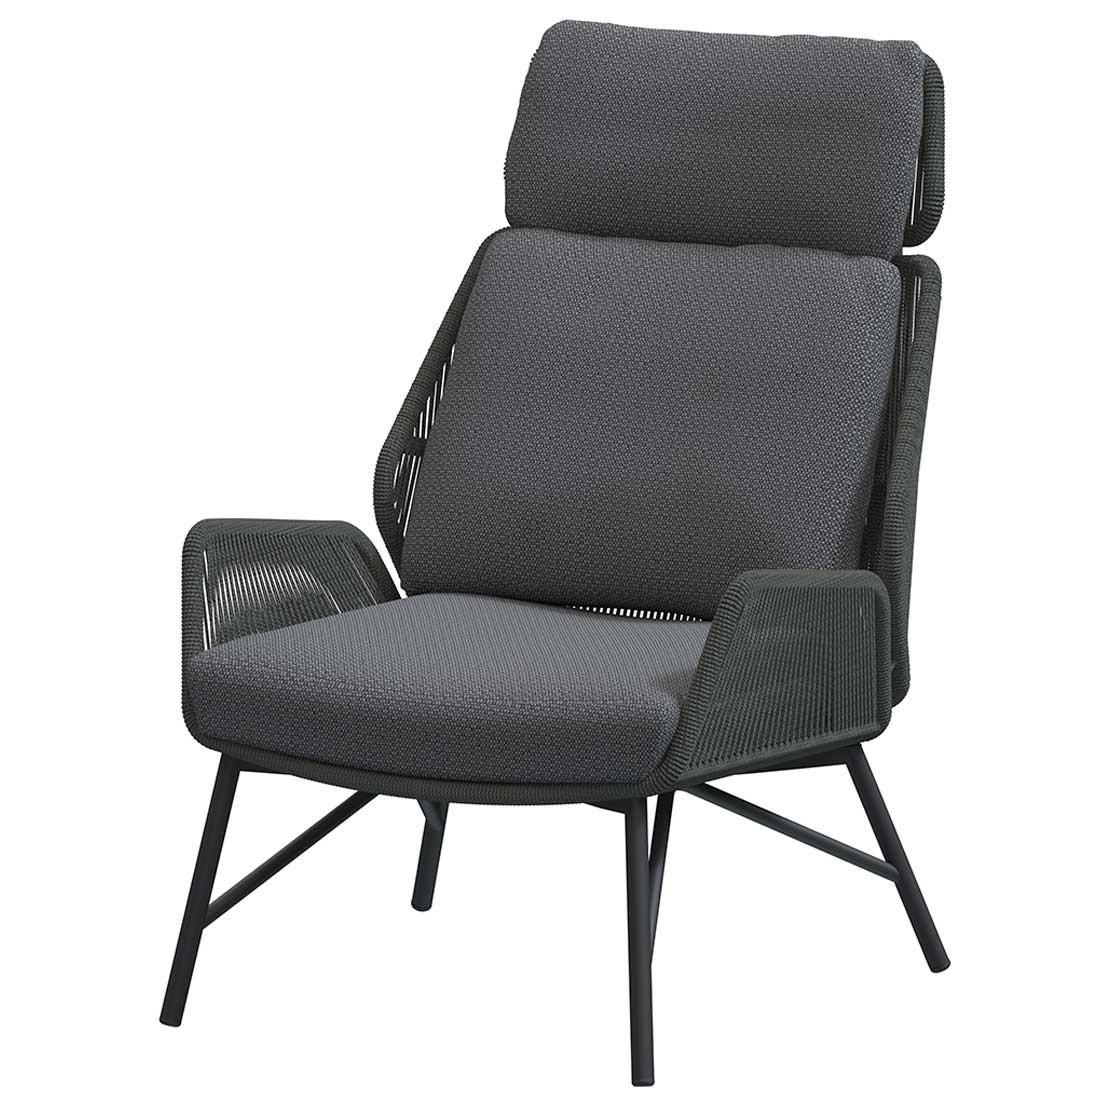 Carthago living chair Platinum with 2 cushions